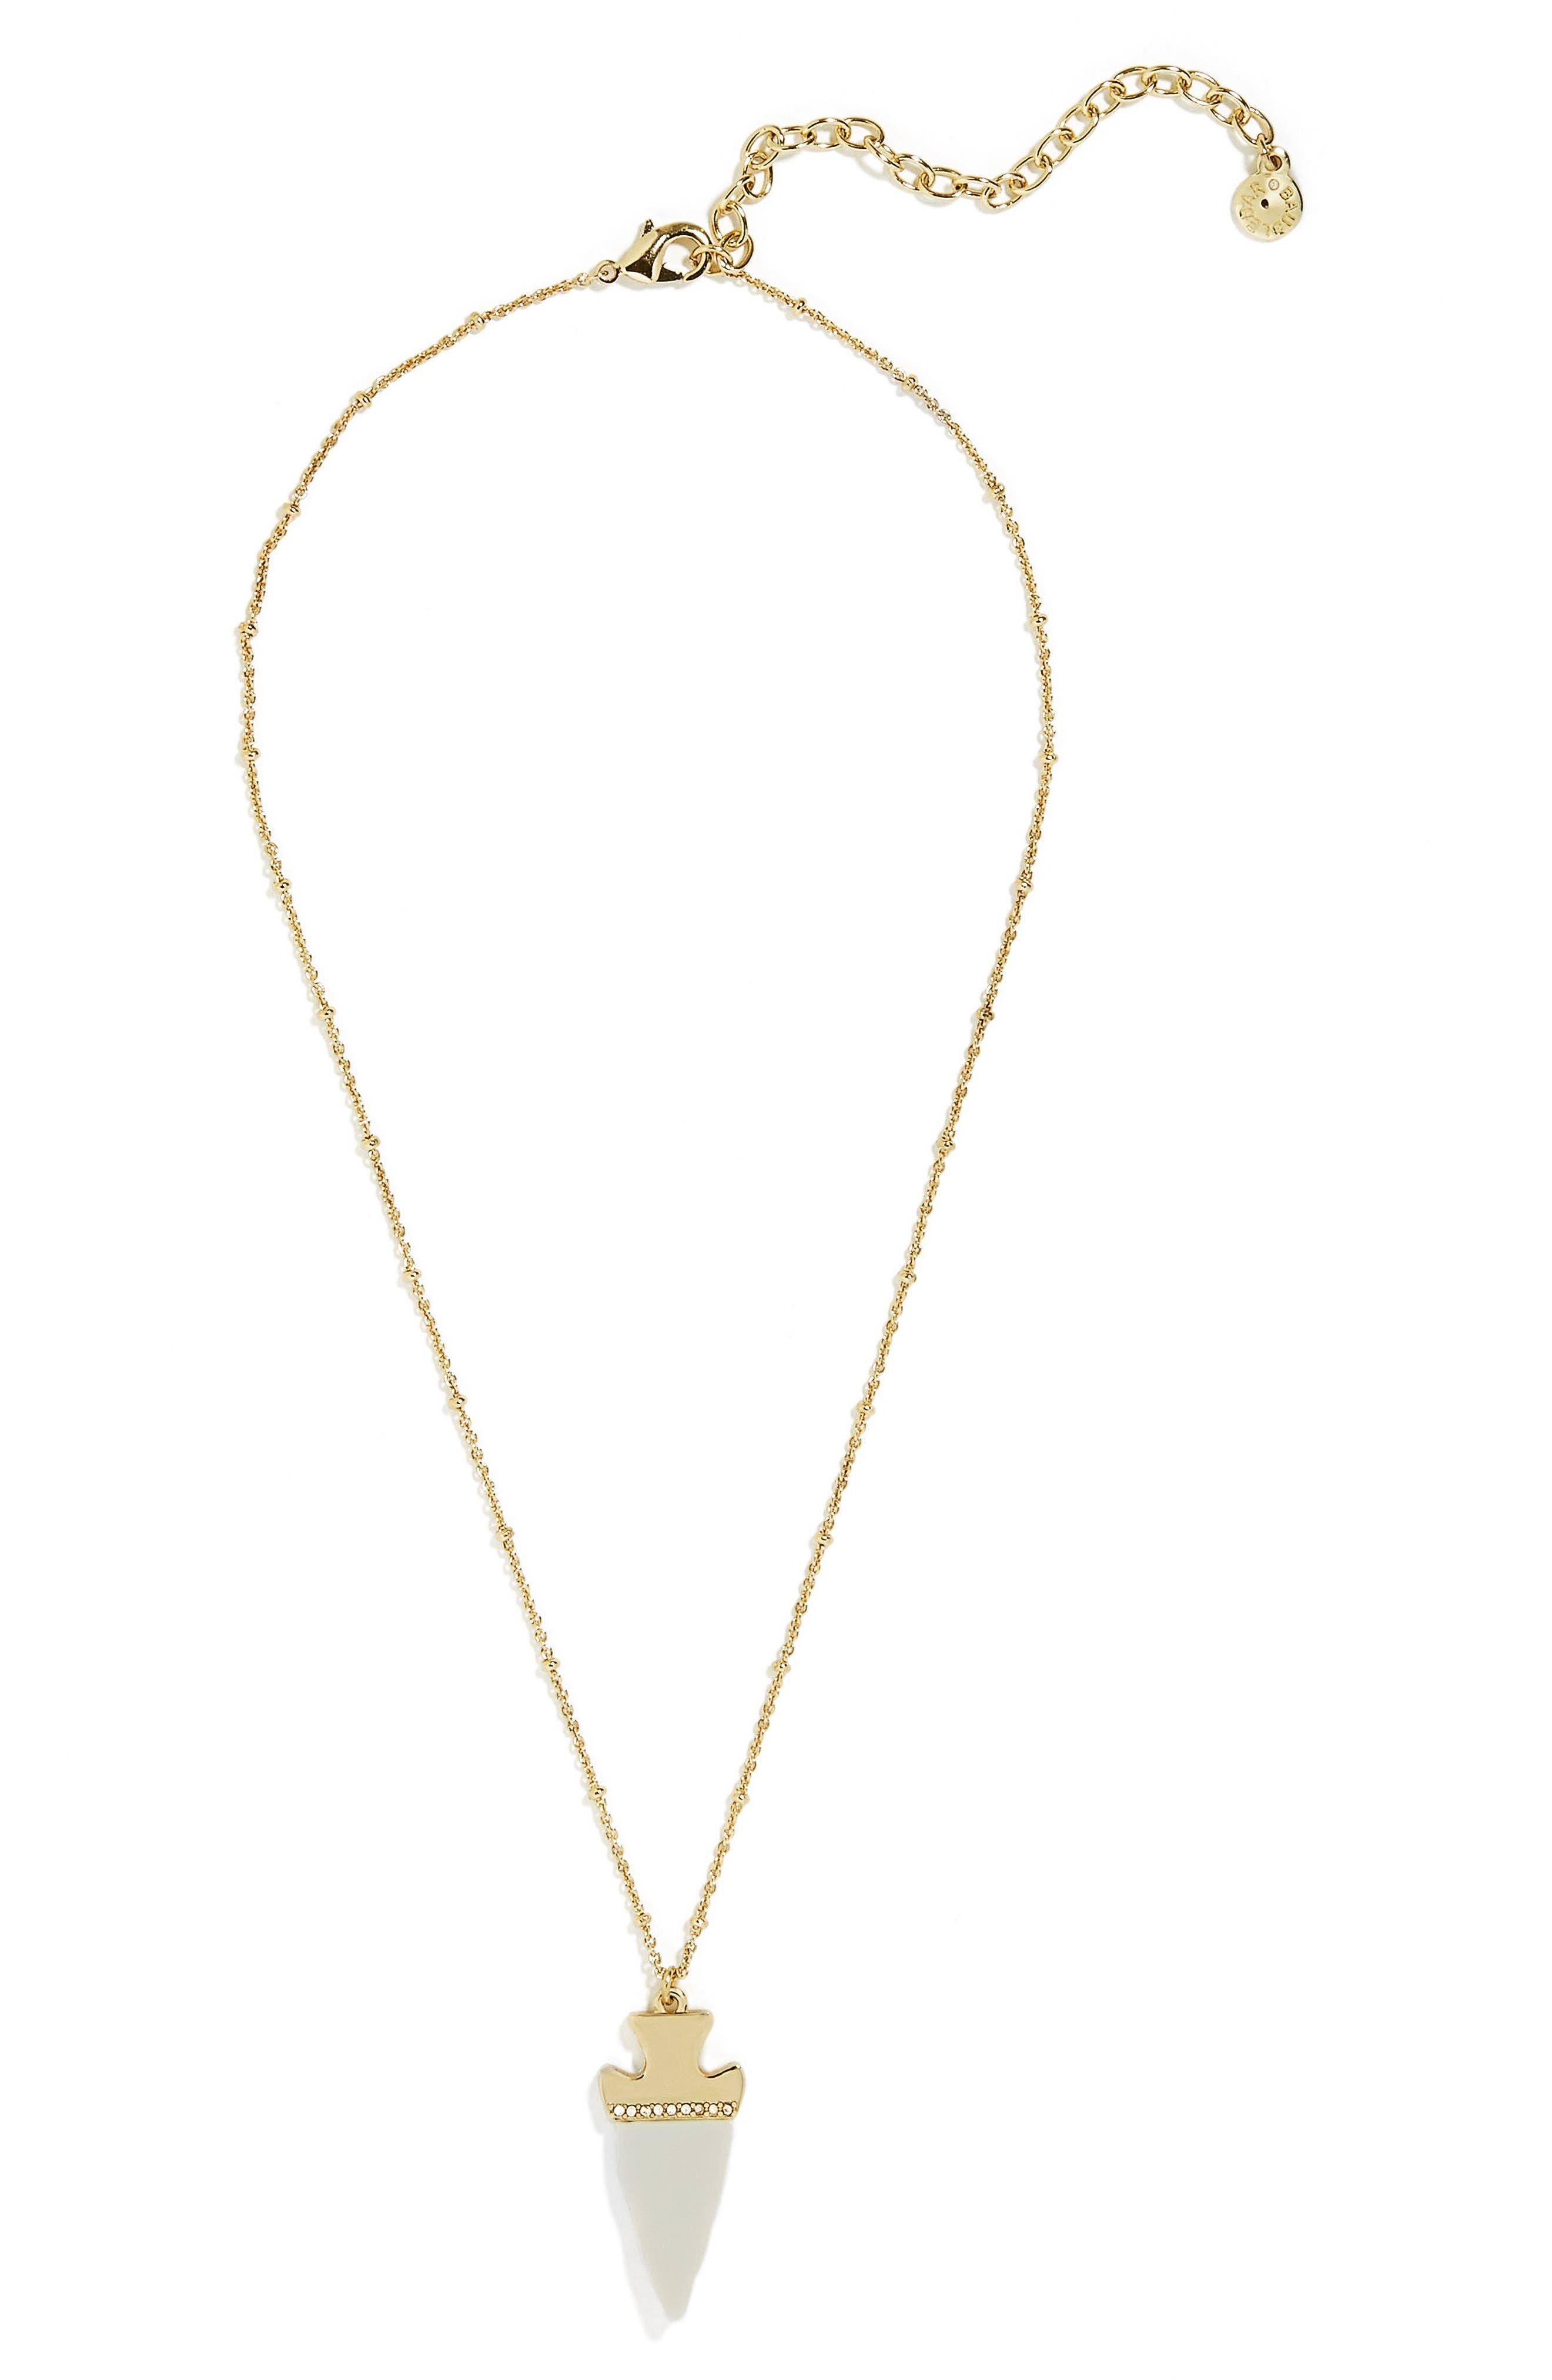 Alternate Image 1 Selected - Baublebar Pallas Pendant Necklace